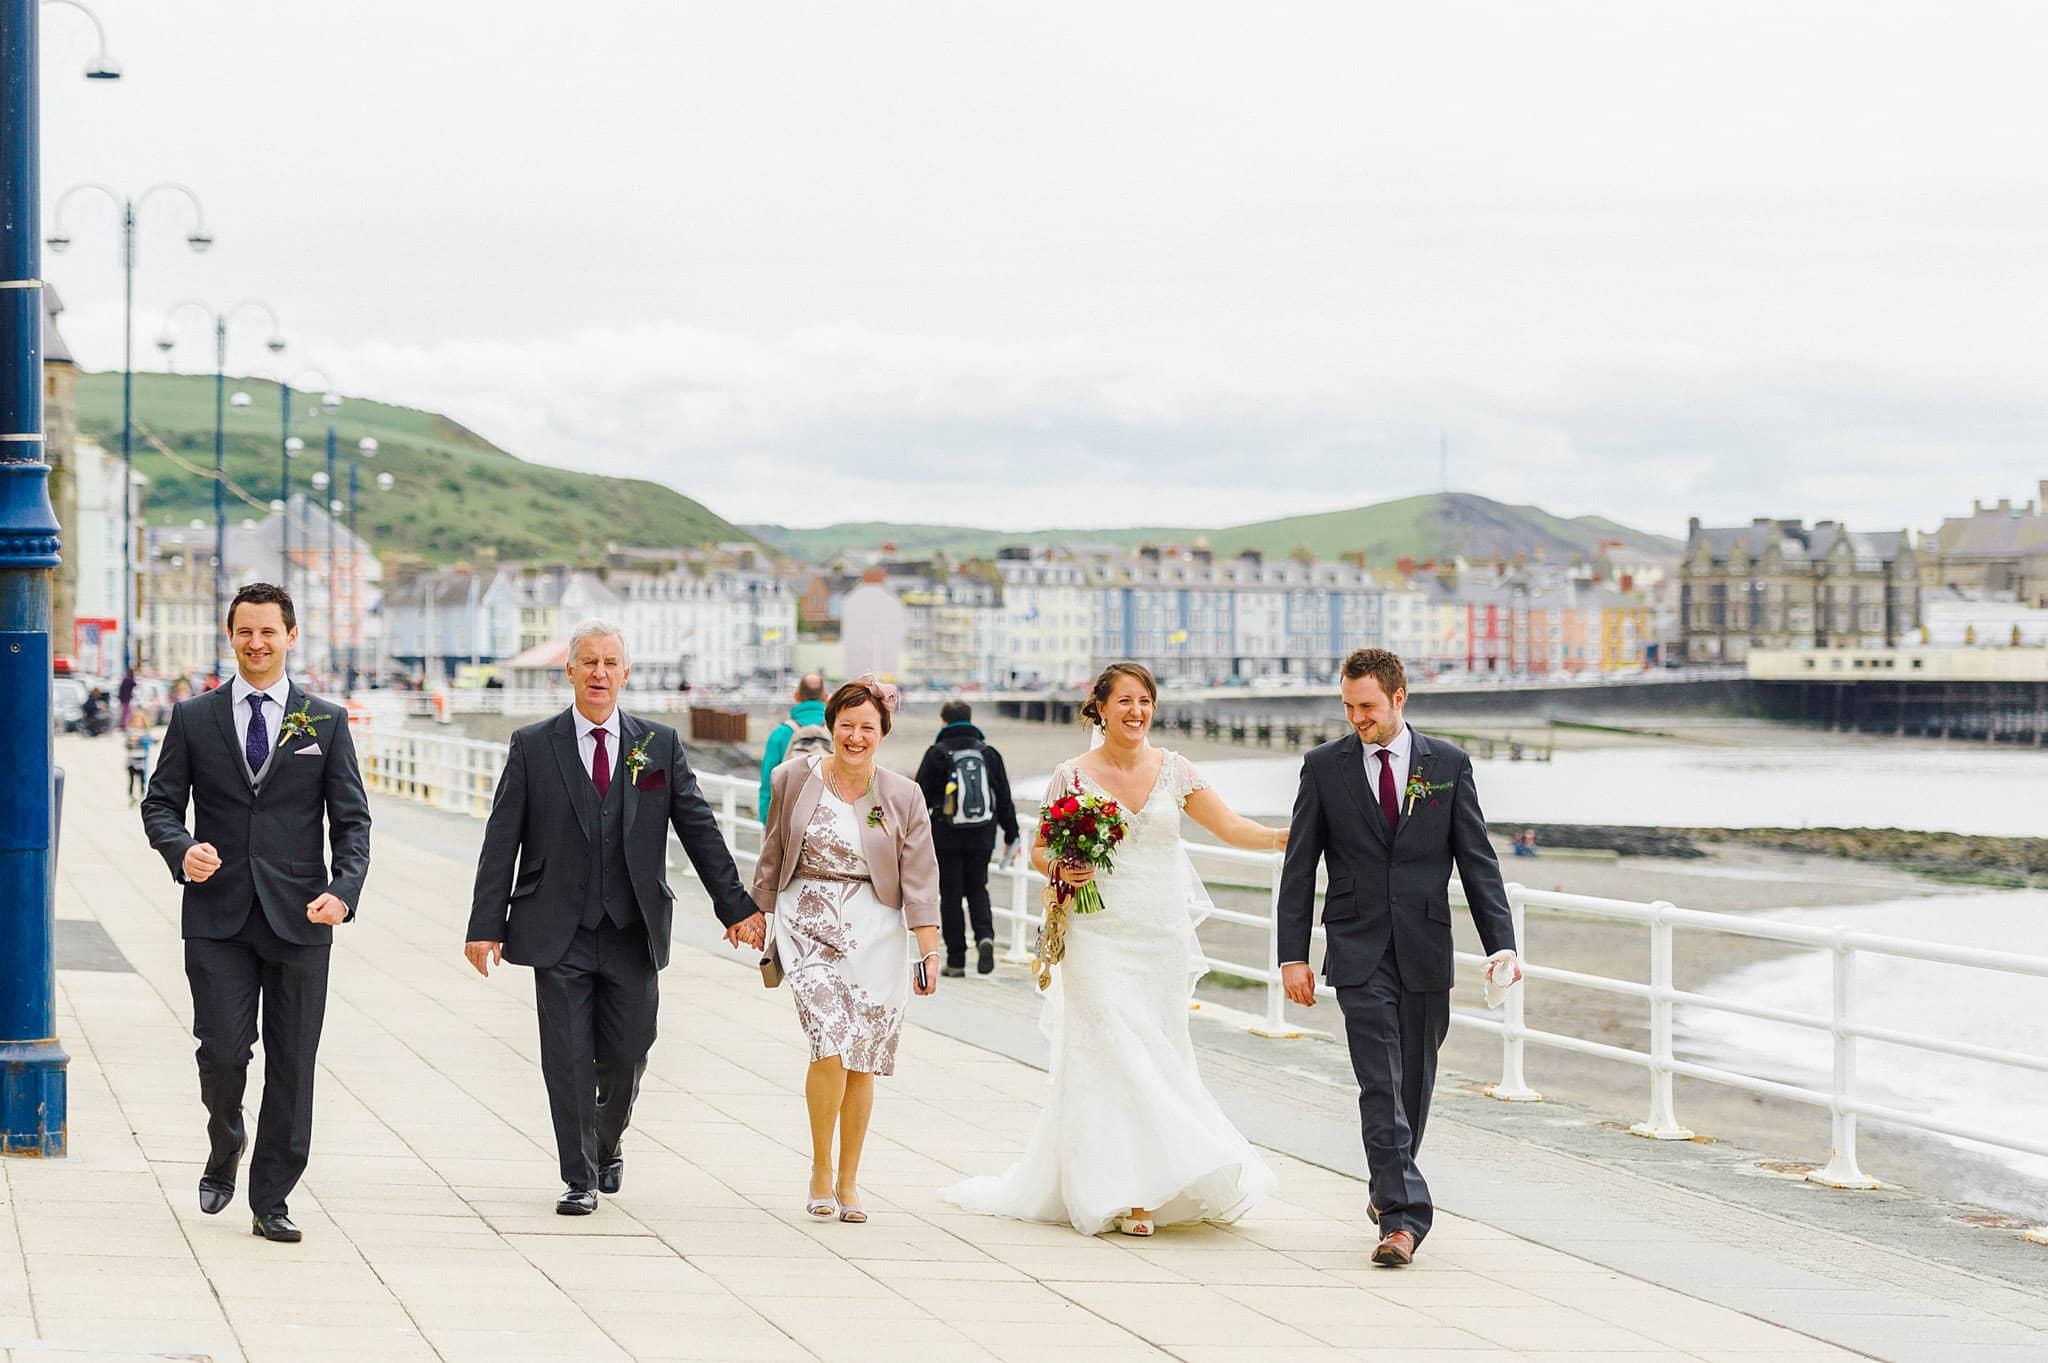 wedding-photographer-aberystwyth-wales (105)